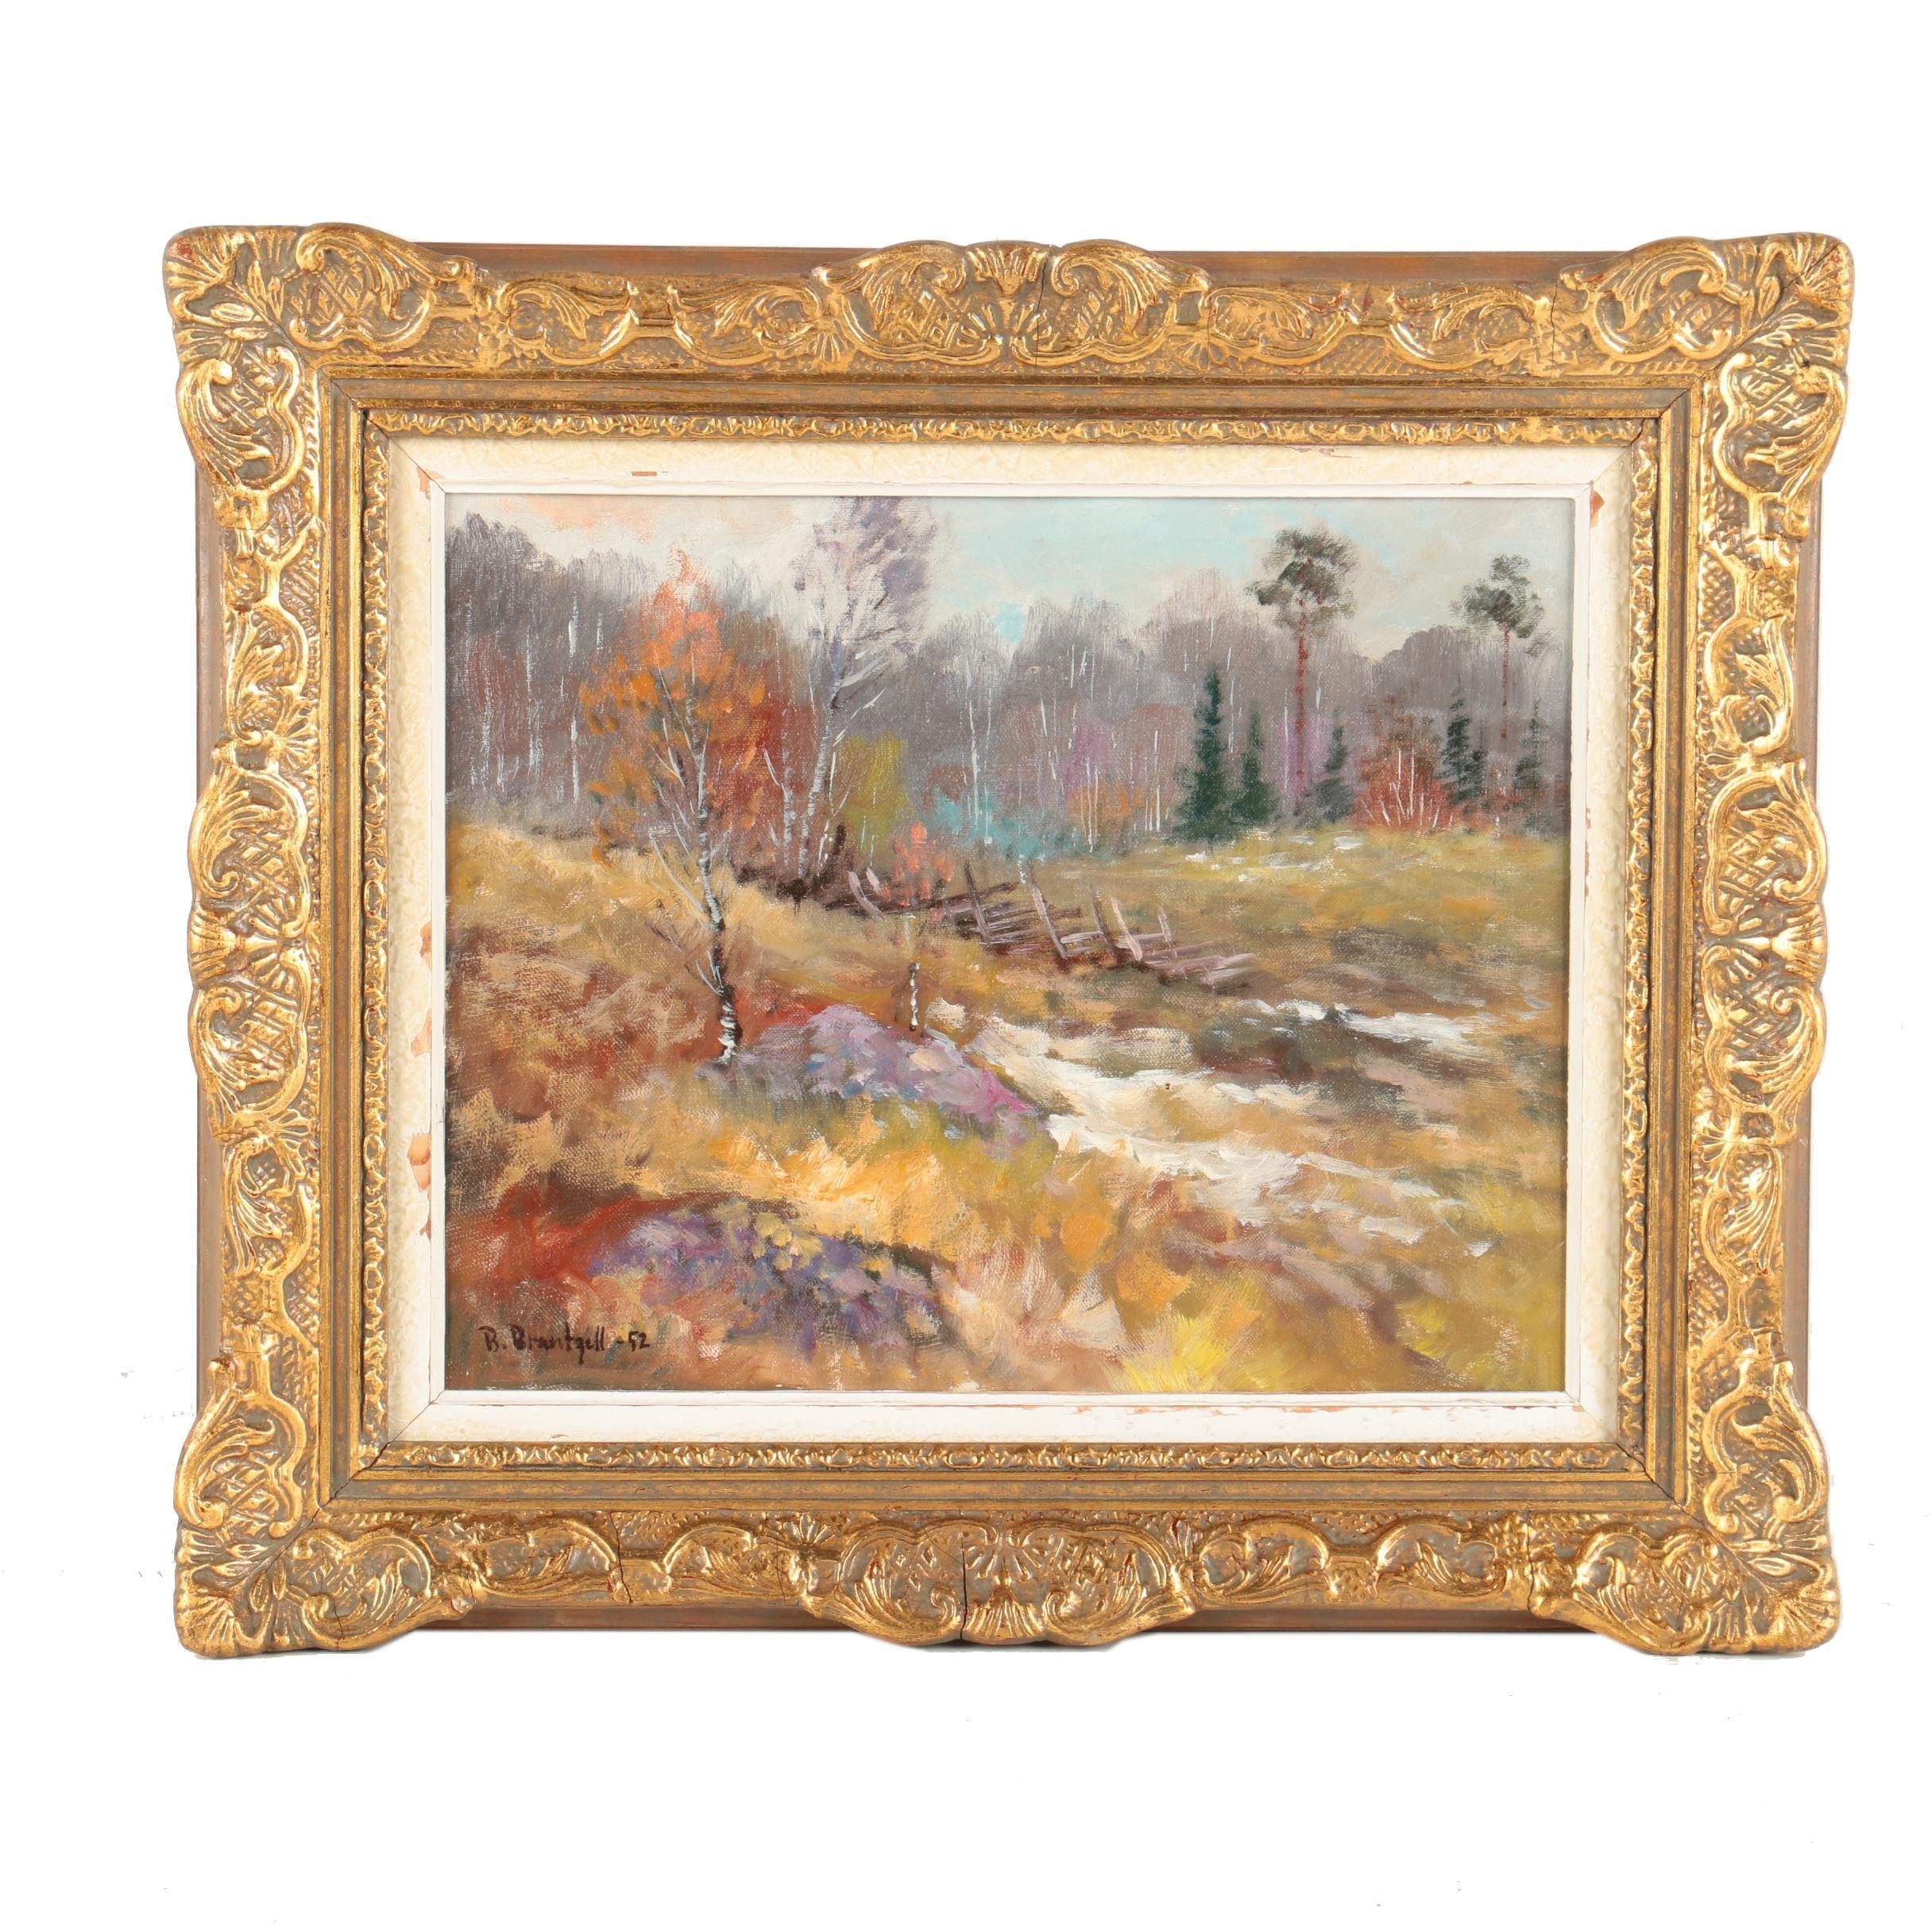 B. Brantzell Original 1952 Oil Painting on Canvas of Autumn Landscape